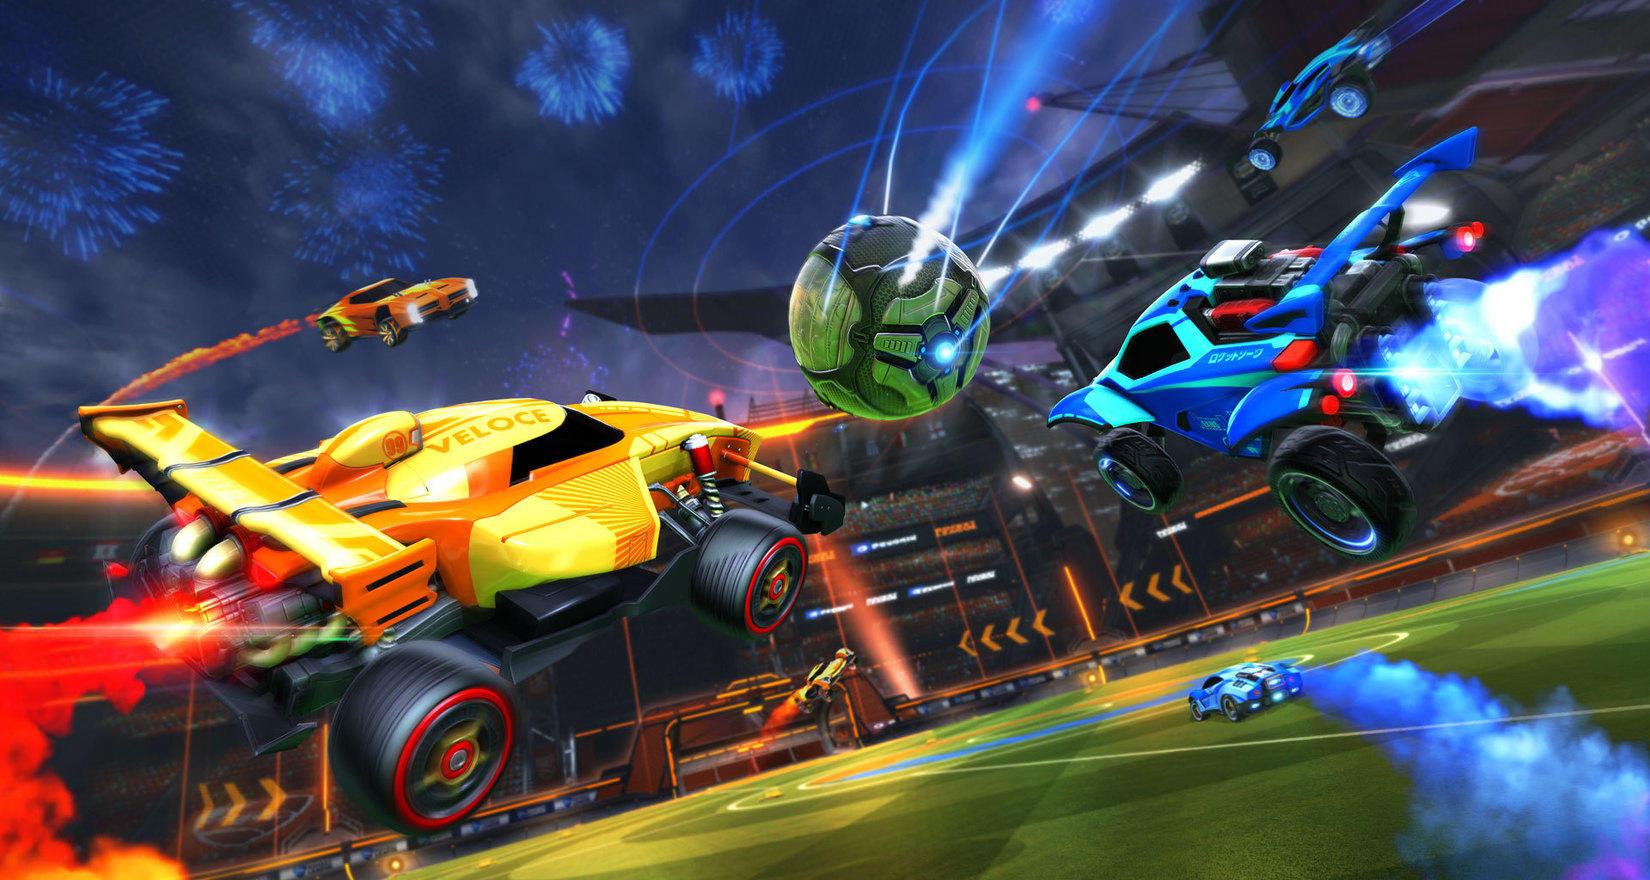 Microsoft Says Sony Is Holding Back Fortnite Cross-Play | Kotaku